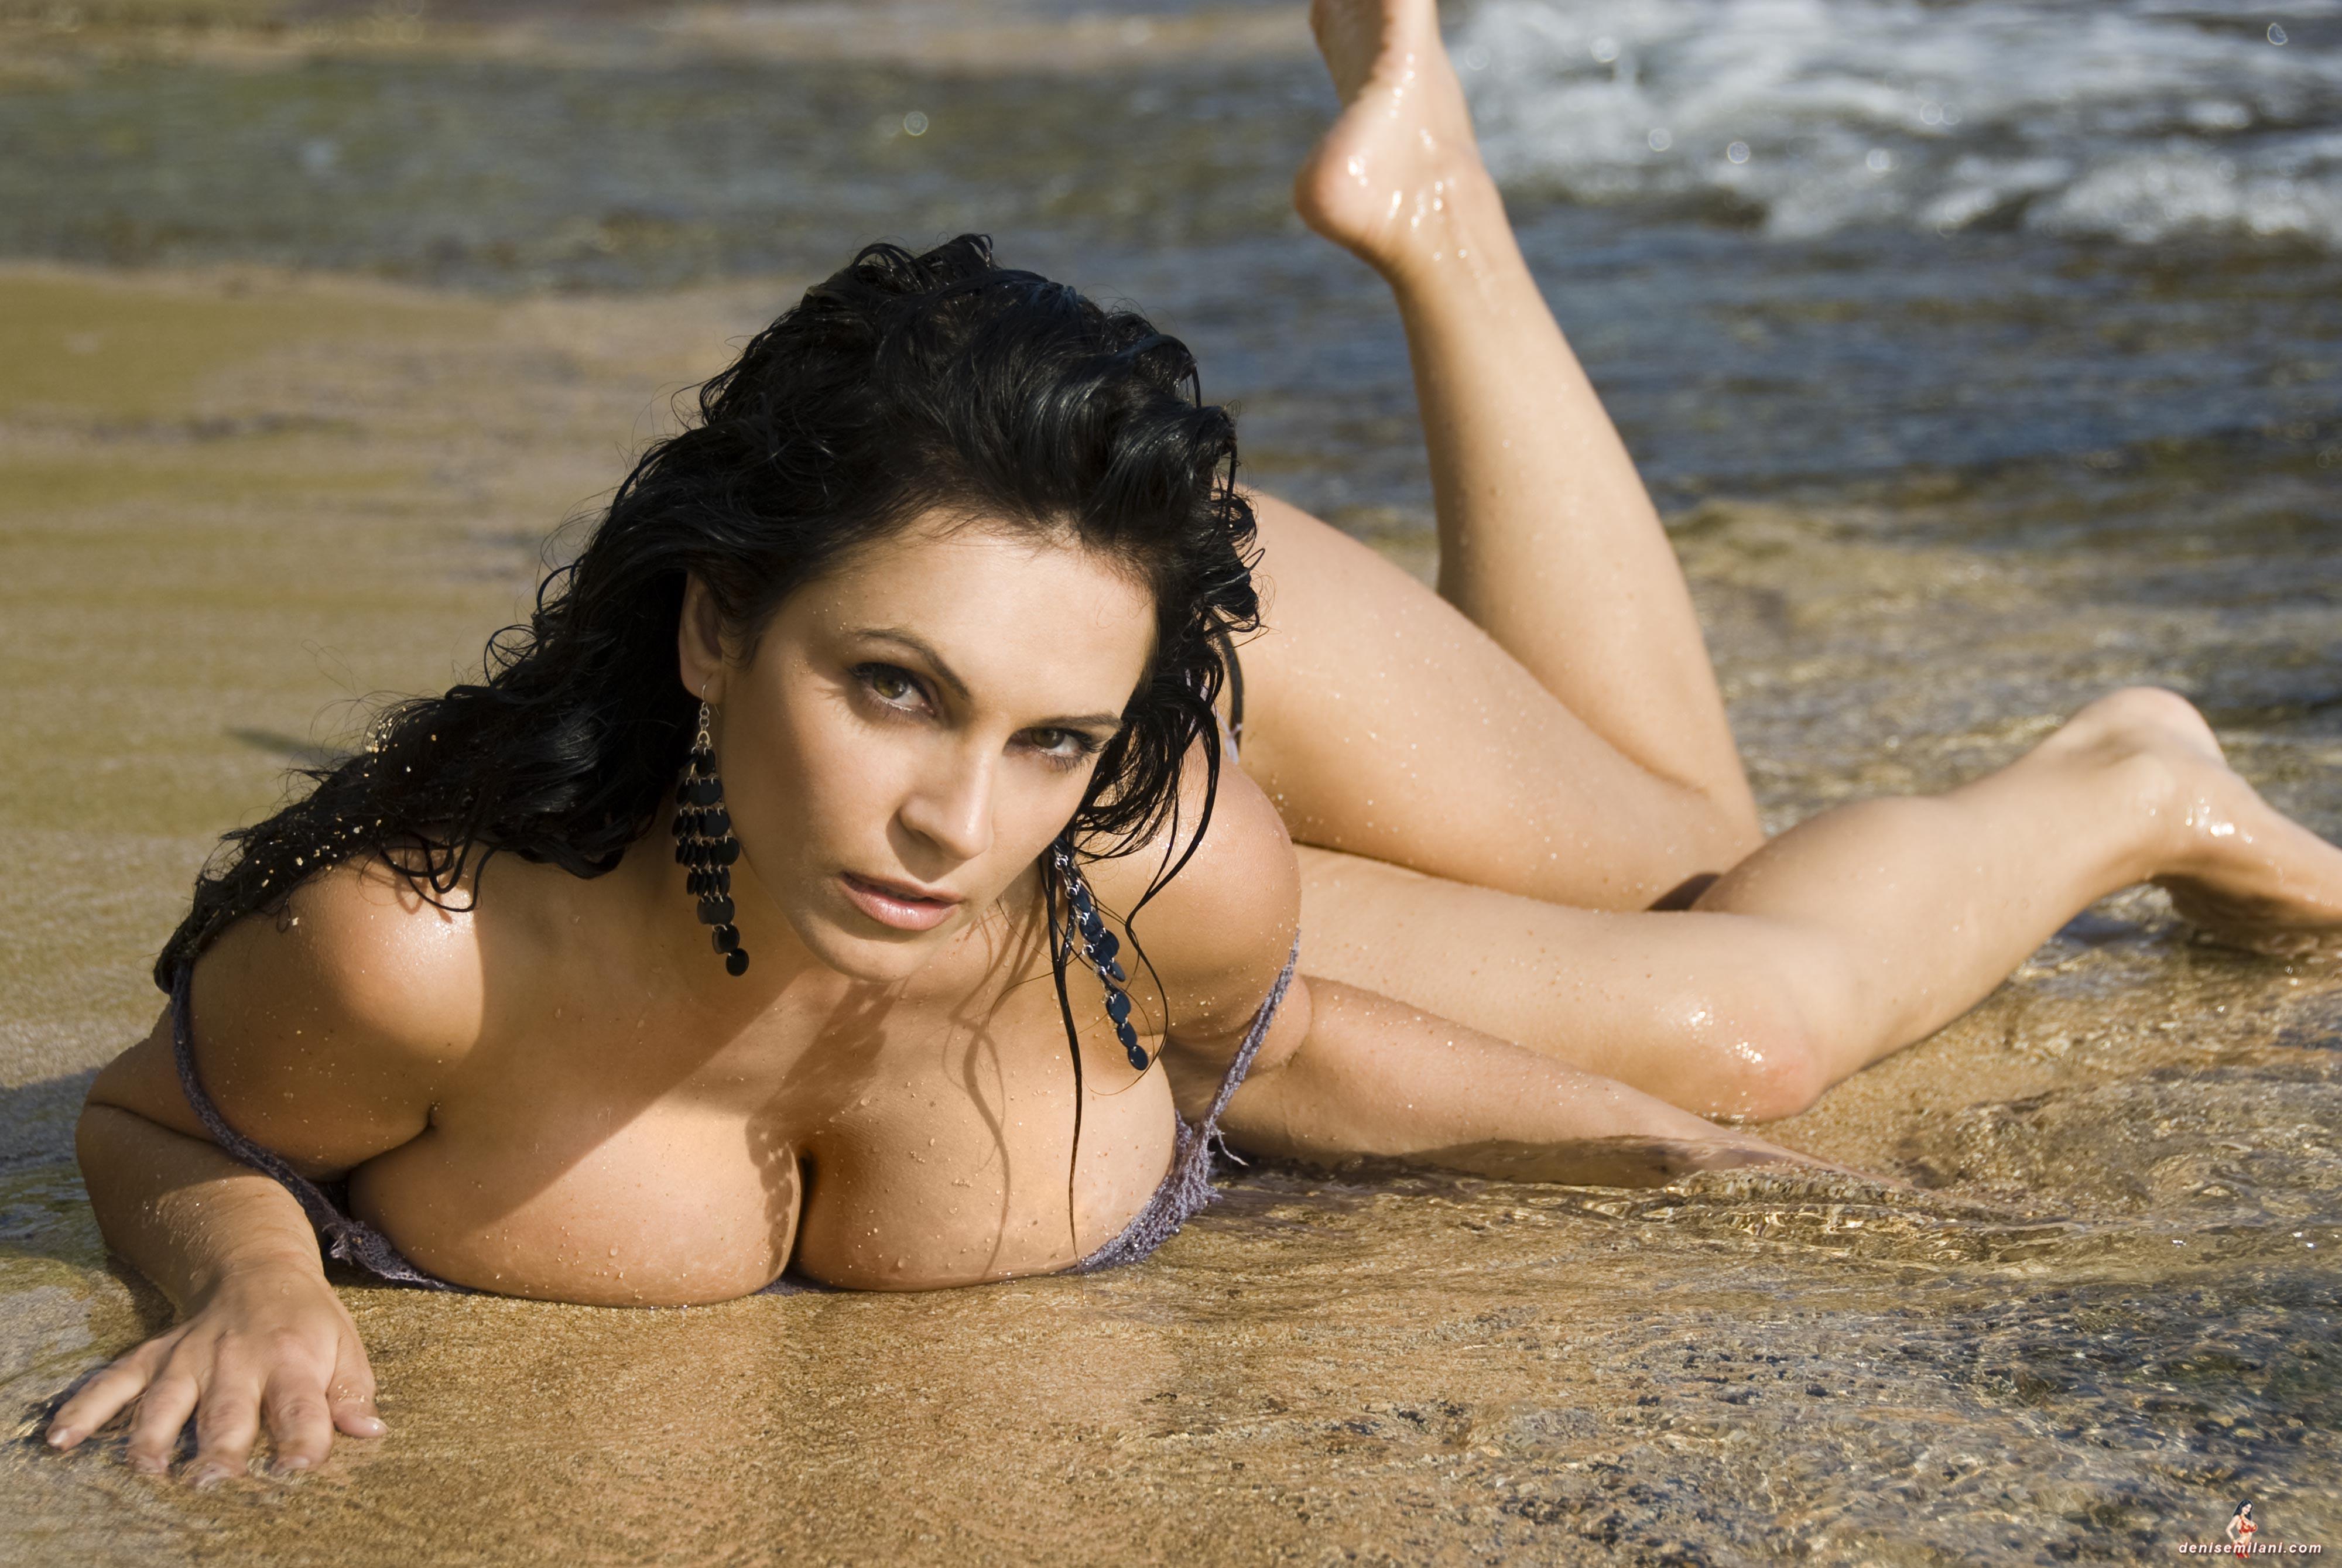 Фото порно денис милани, Denise Milani - все порно и секс фото модели 20 фотография